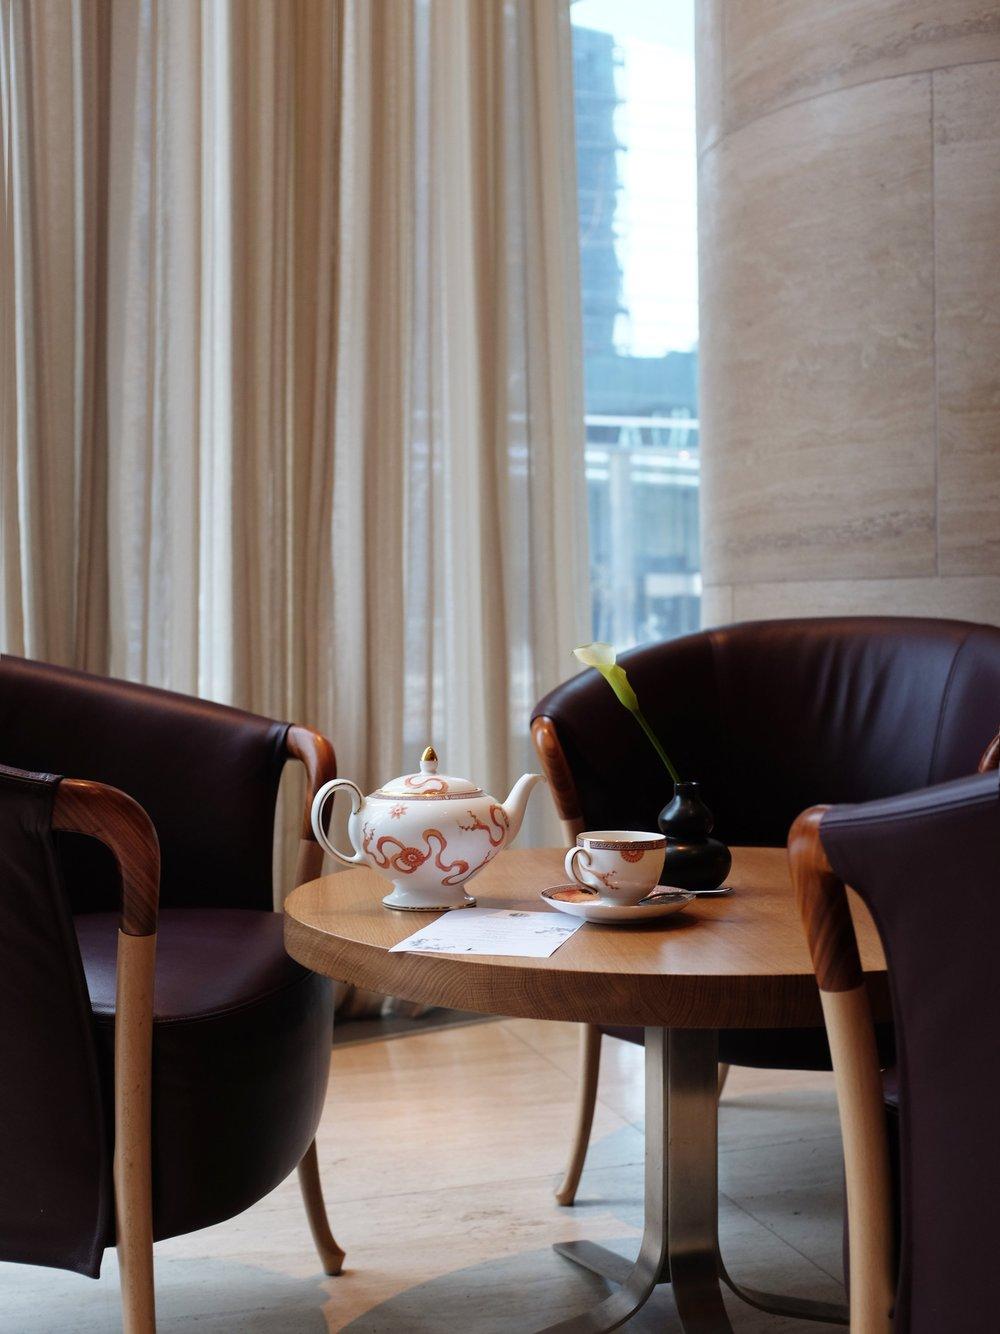 shangri la toronto hotel menswear ootd travel